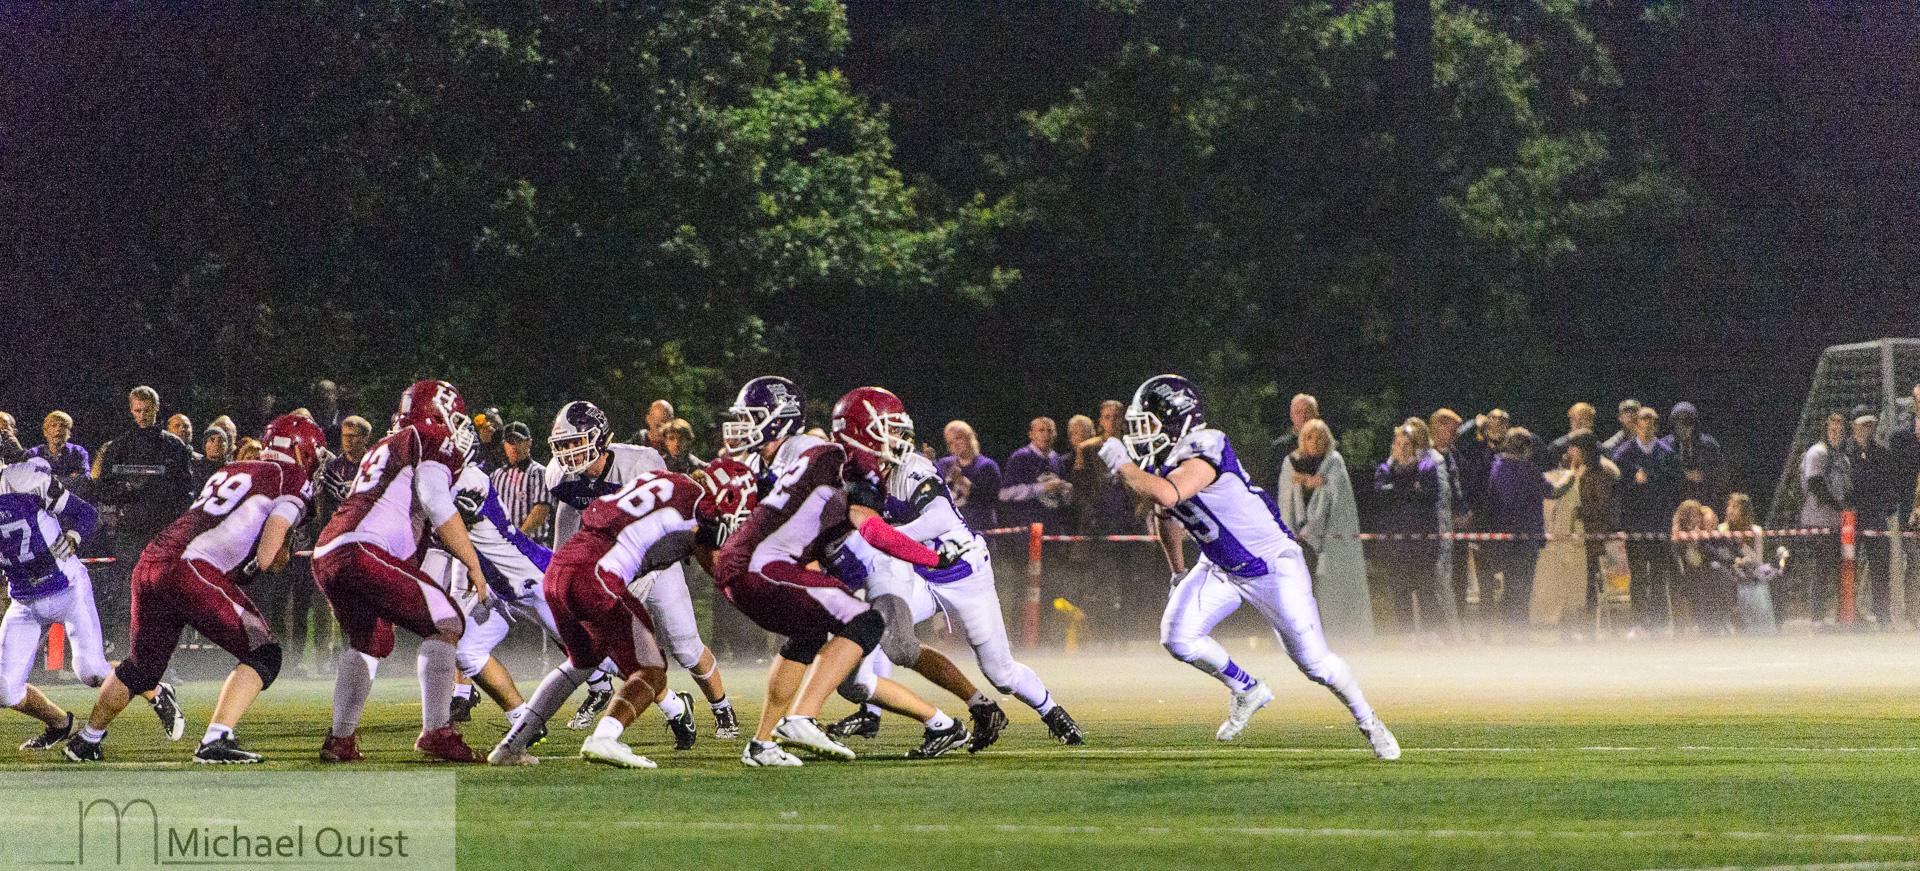 Junior-Bowl-2015-Copenhagen-Towers-vs-Herlev-Rebels-177